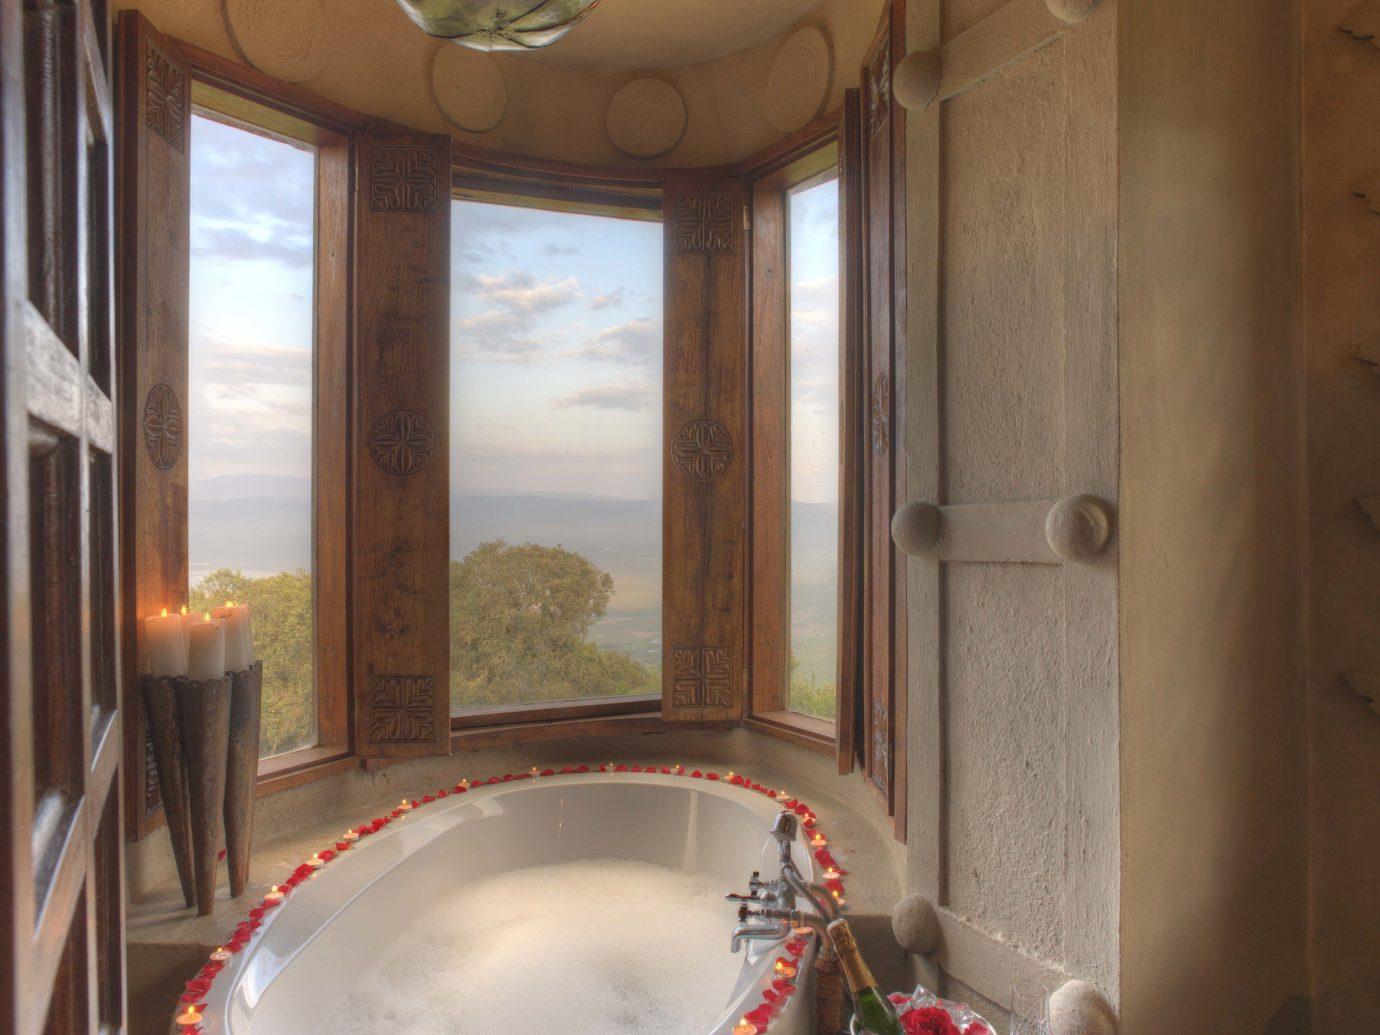 Bathroom at andBeyond Ngorongoro Crater Lodge, Tanzania African Safari